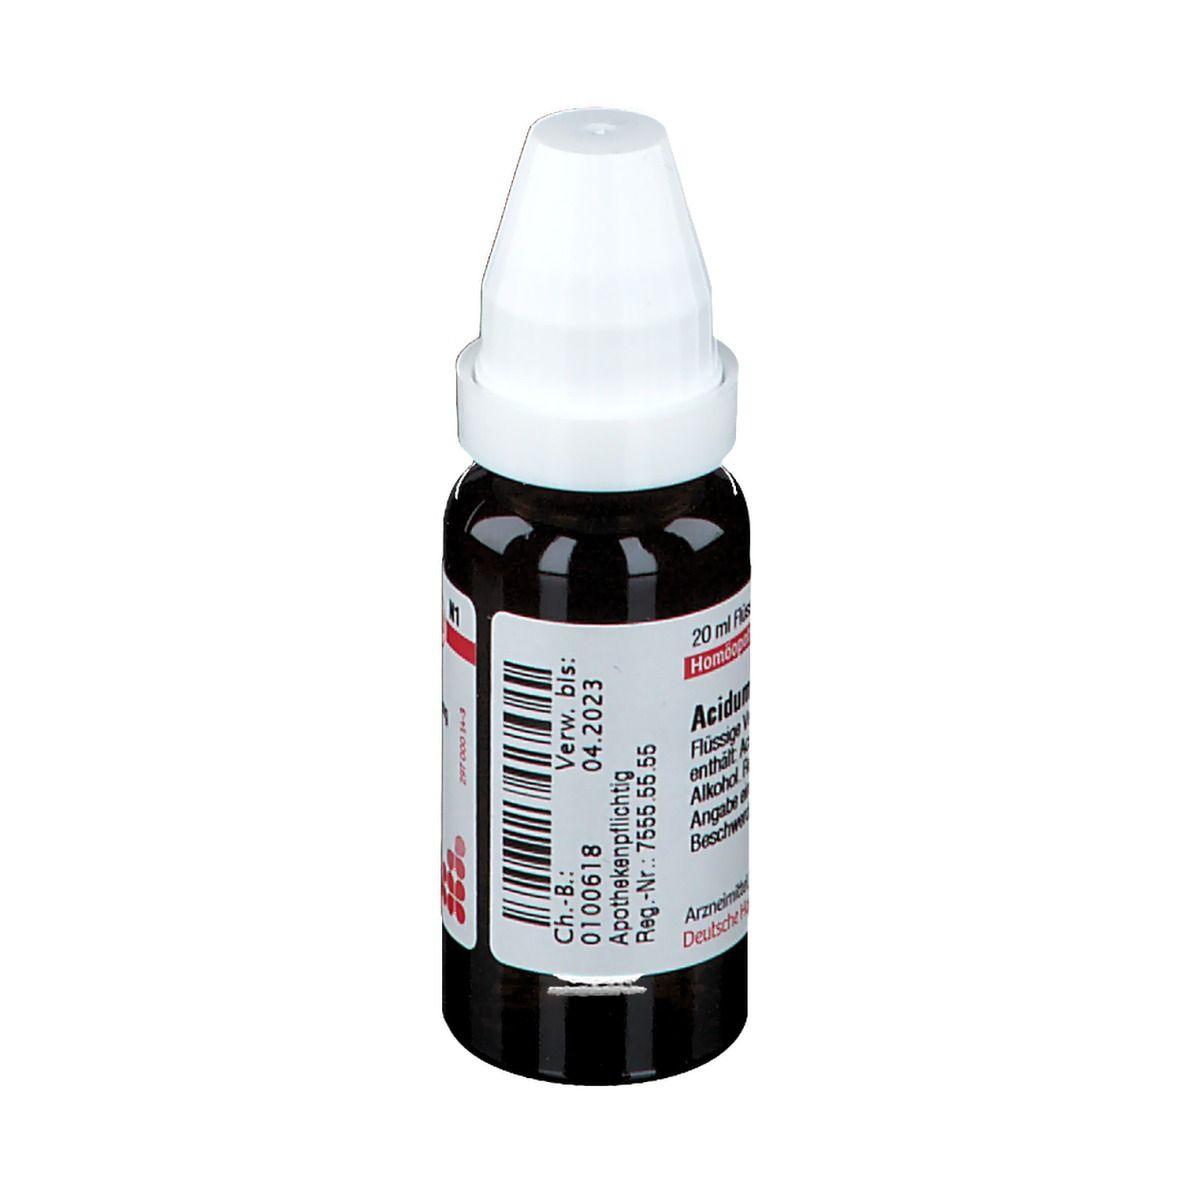 DHU Acidum Phosphoricum D6